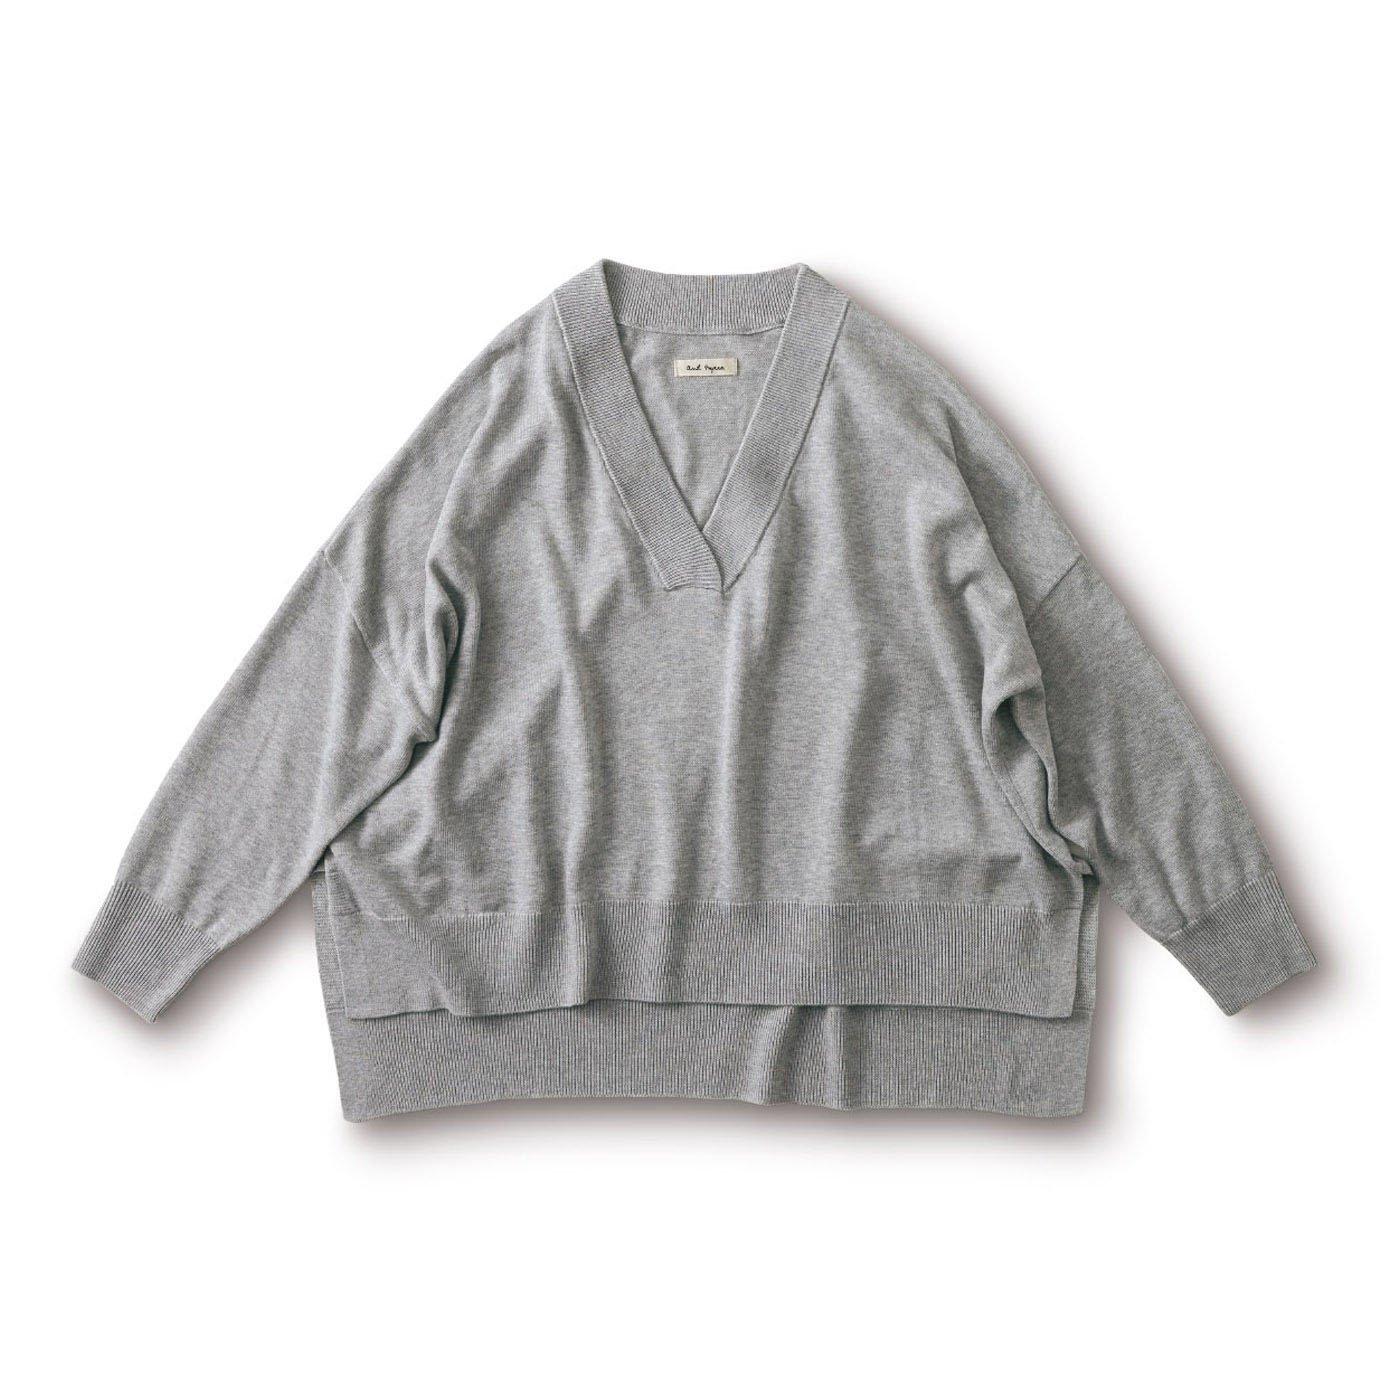 and myera 四角いセーター〈グレー杢〉